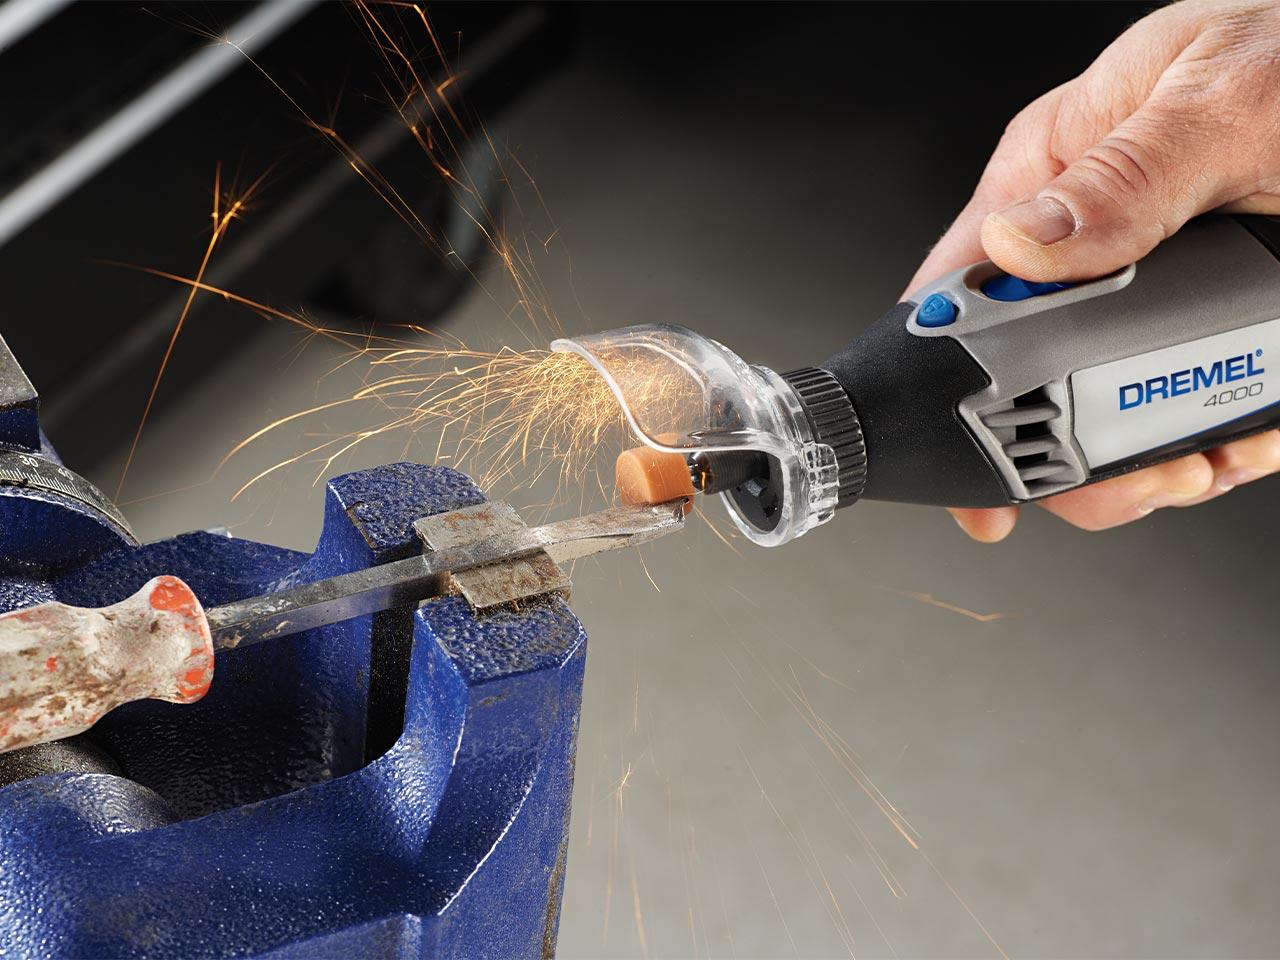 Dremel 2 x 8193 Aluminum Oxide Grinding Stone 15.9mm New